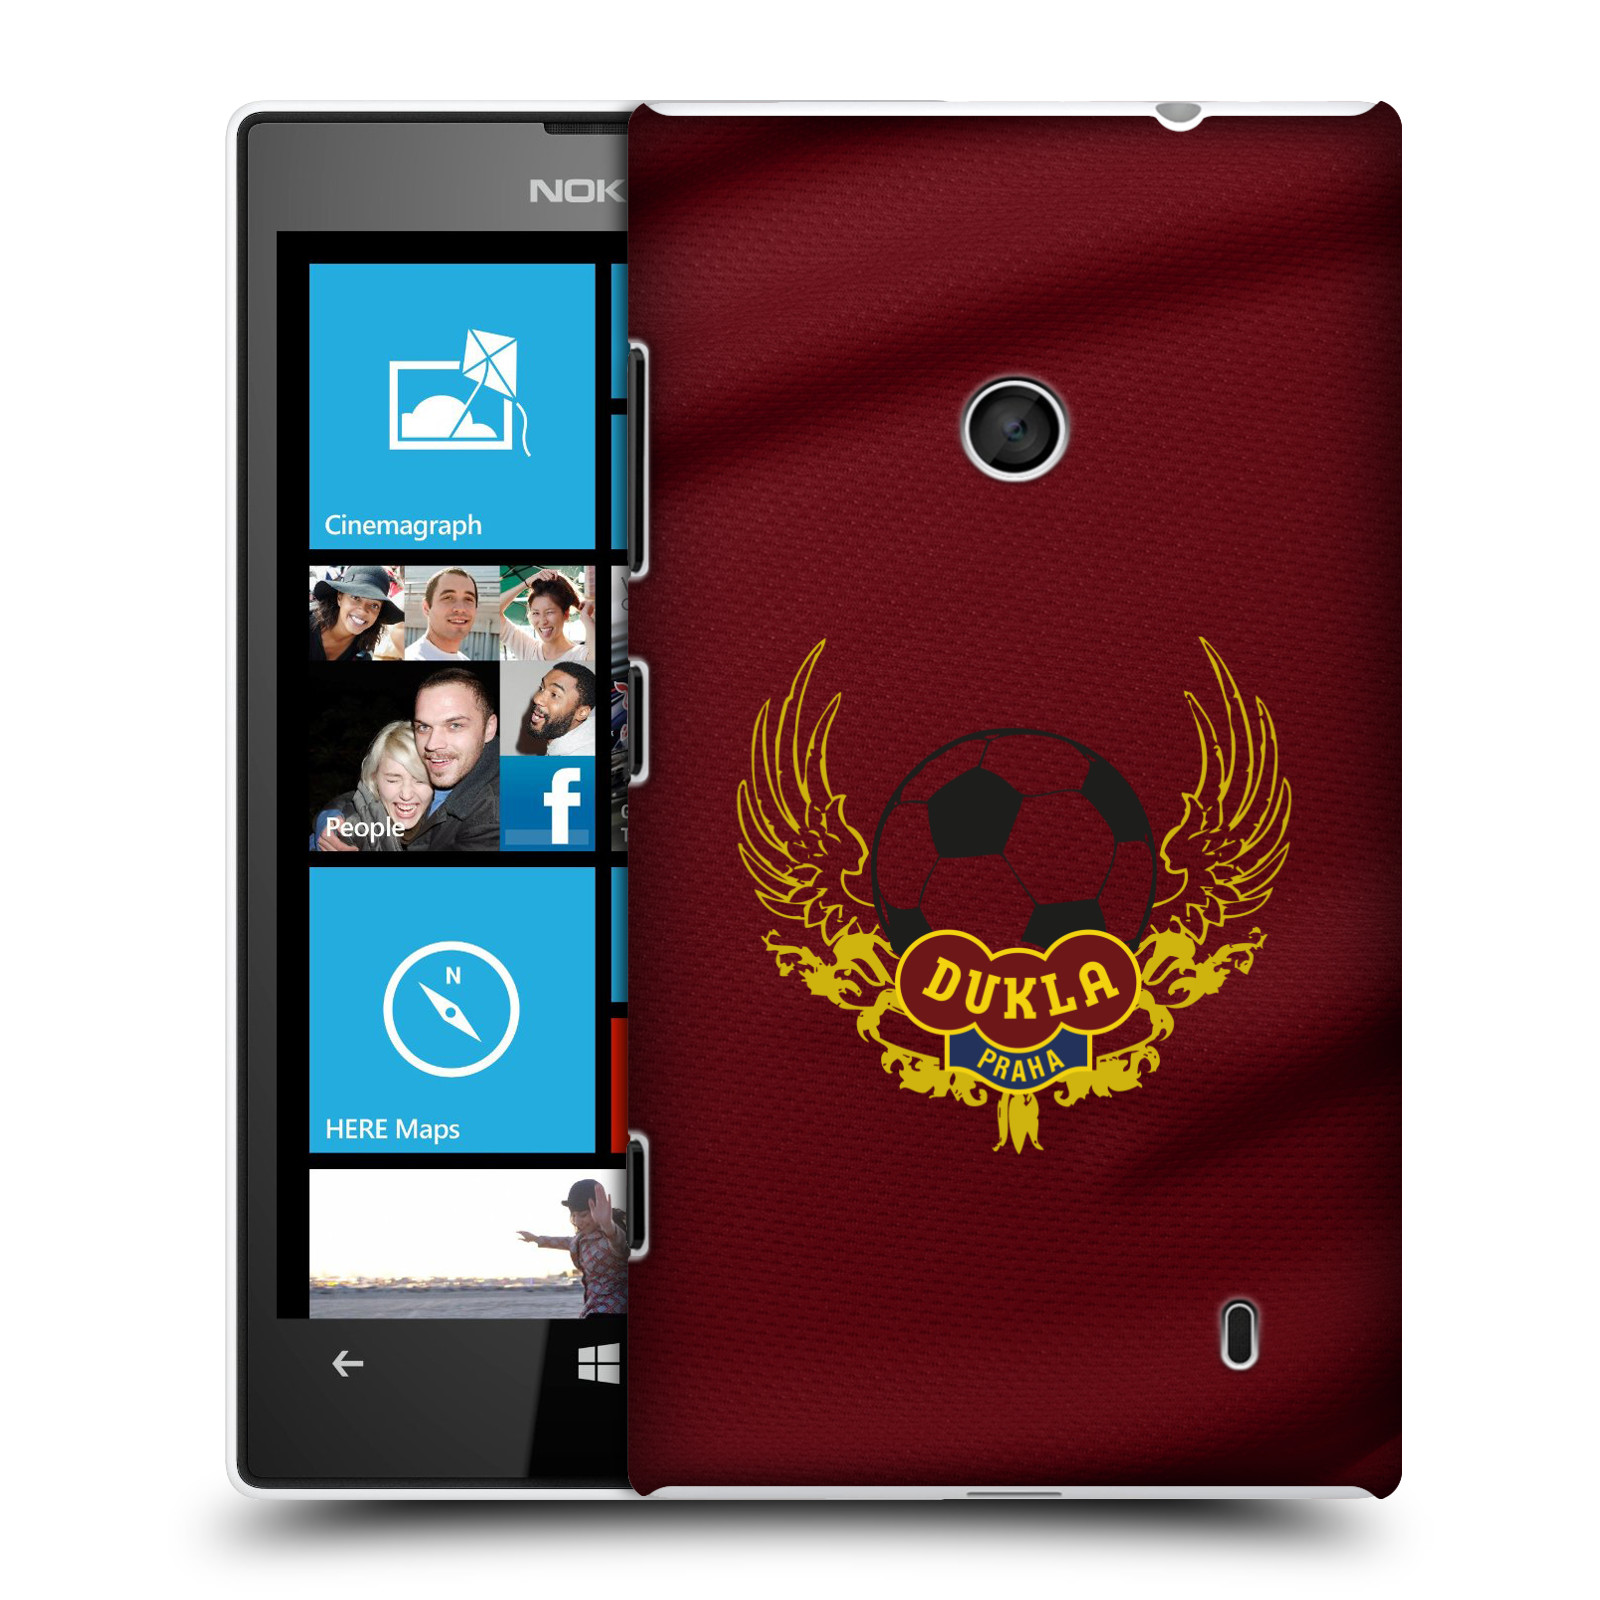 Plastové pouzdro na mobil Nokia Lumia 520 - FK Dukla Praha - Okřídlené logo